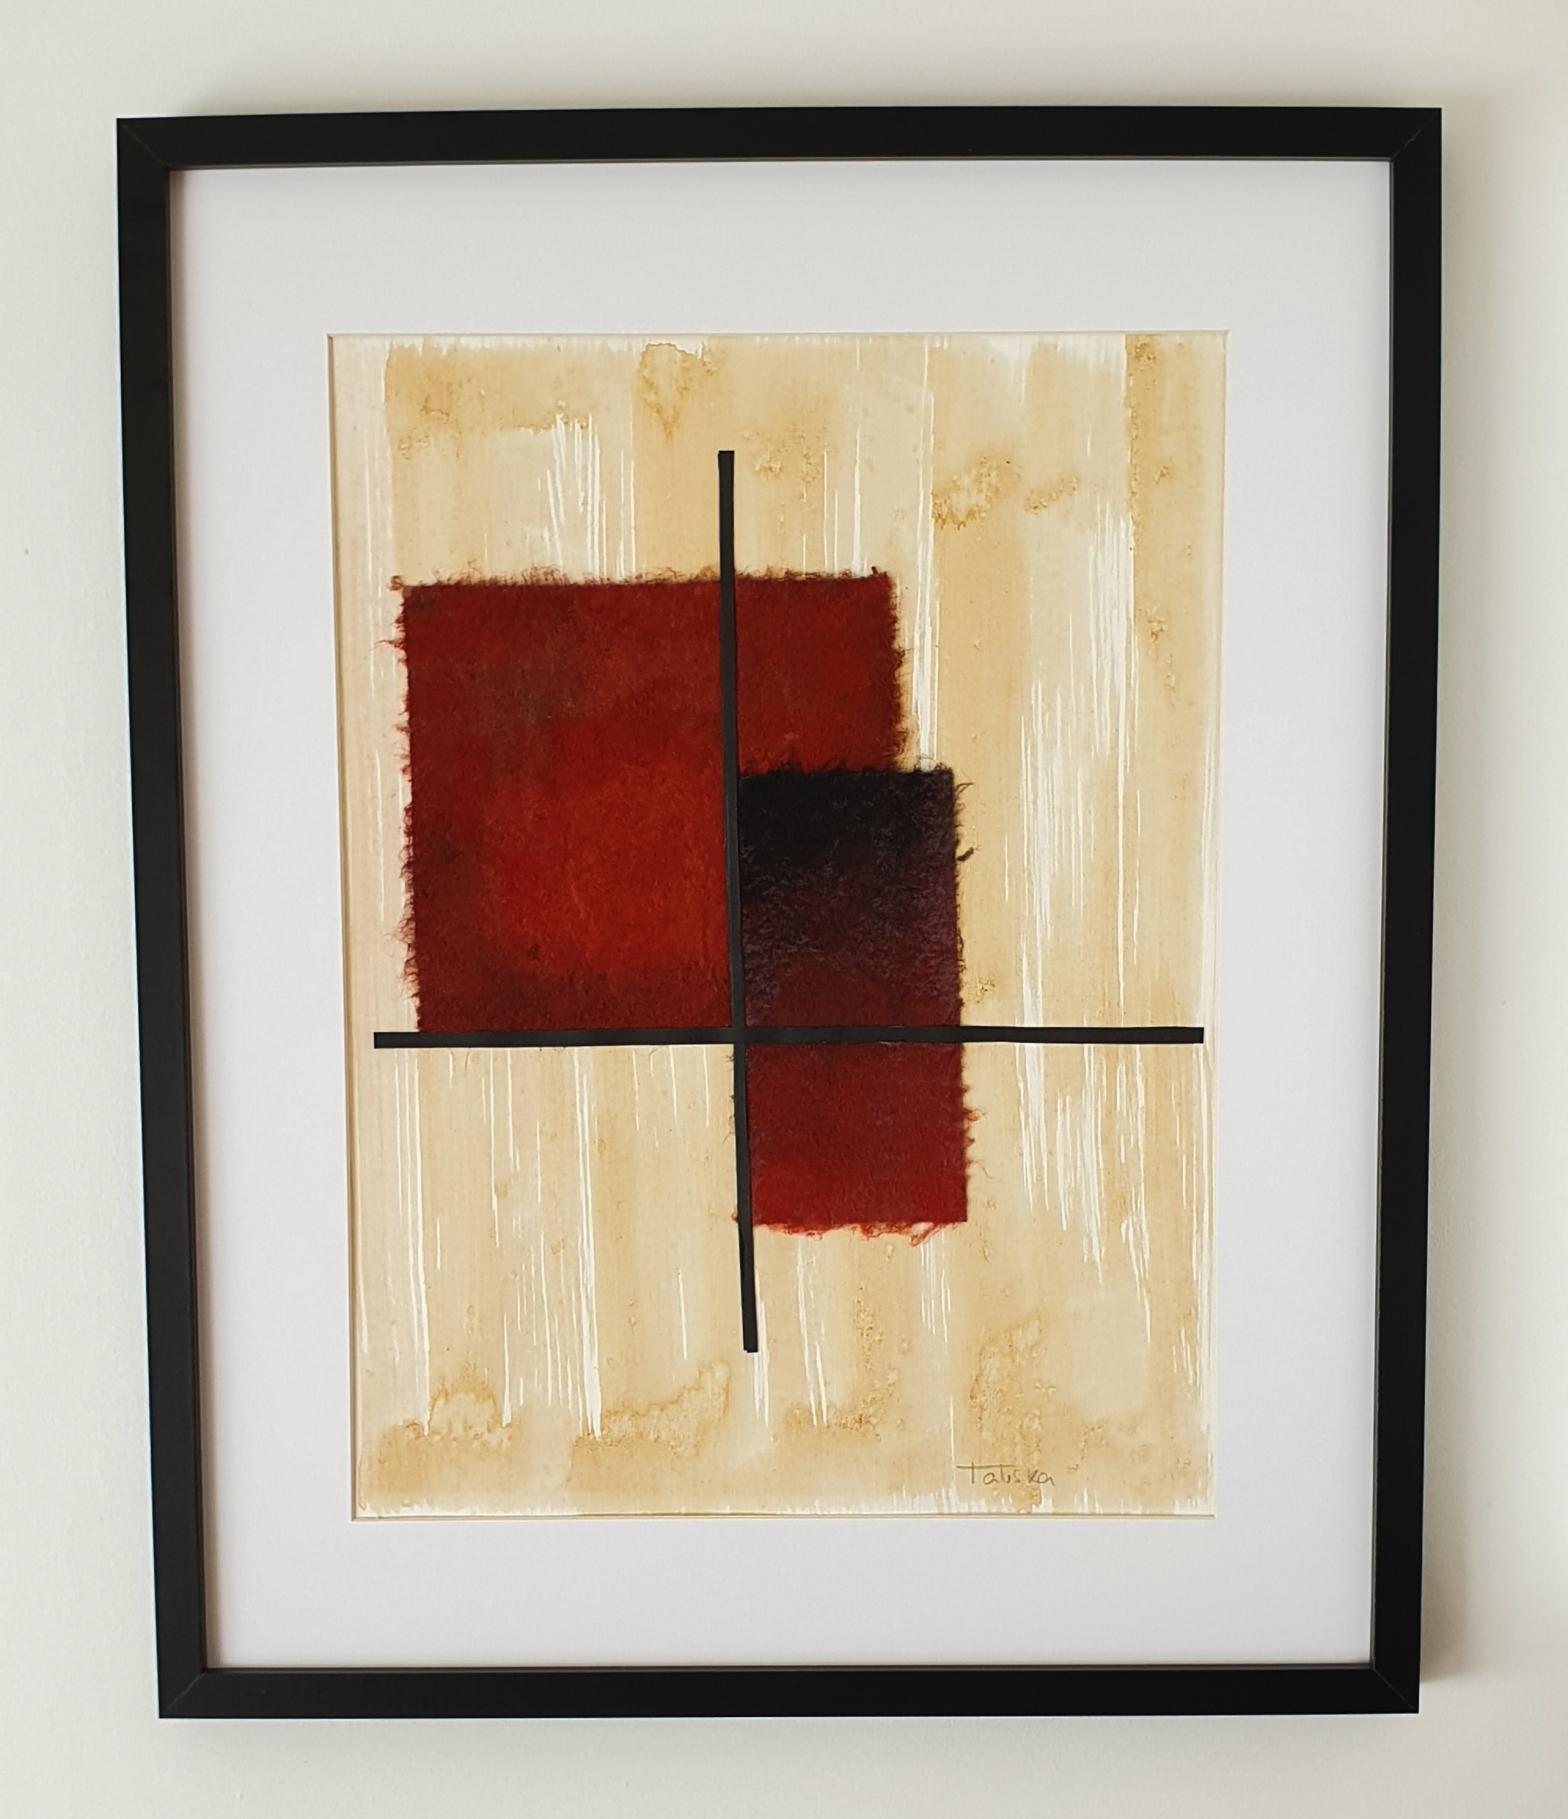 "Cuadro de arte abstracto titulado ""Burning couple"" de la artista Tatuska (https://artuska.com)"